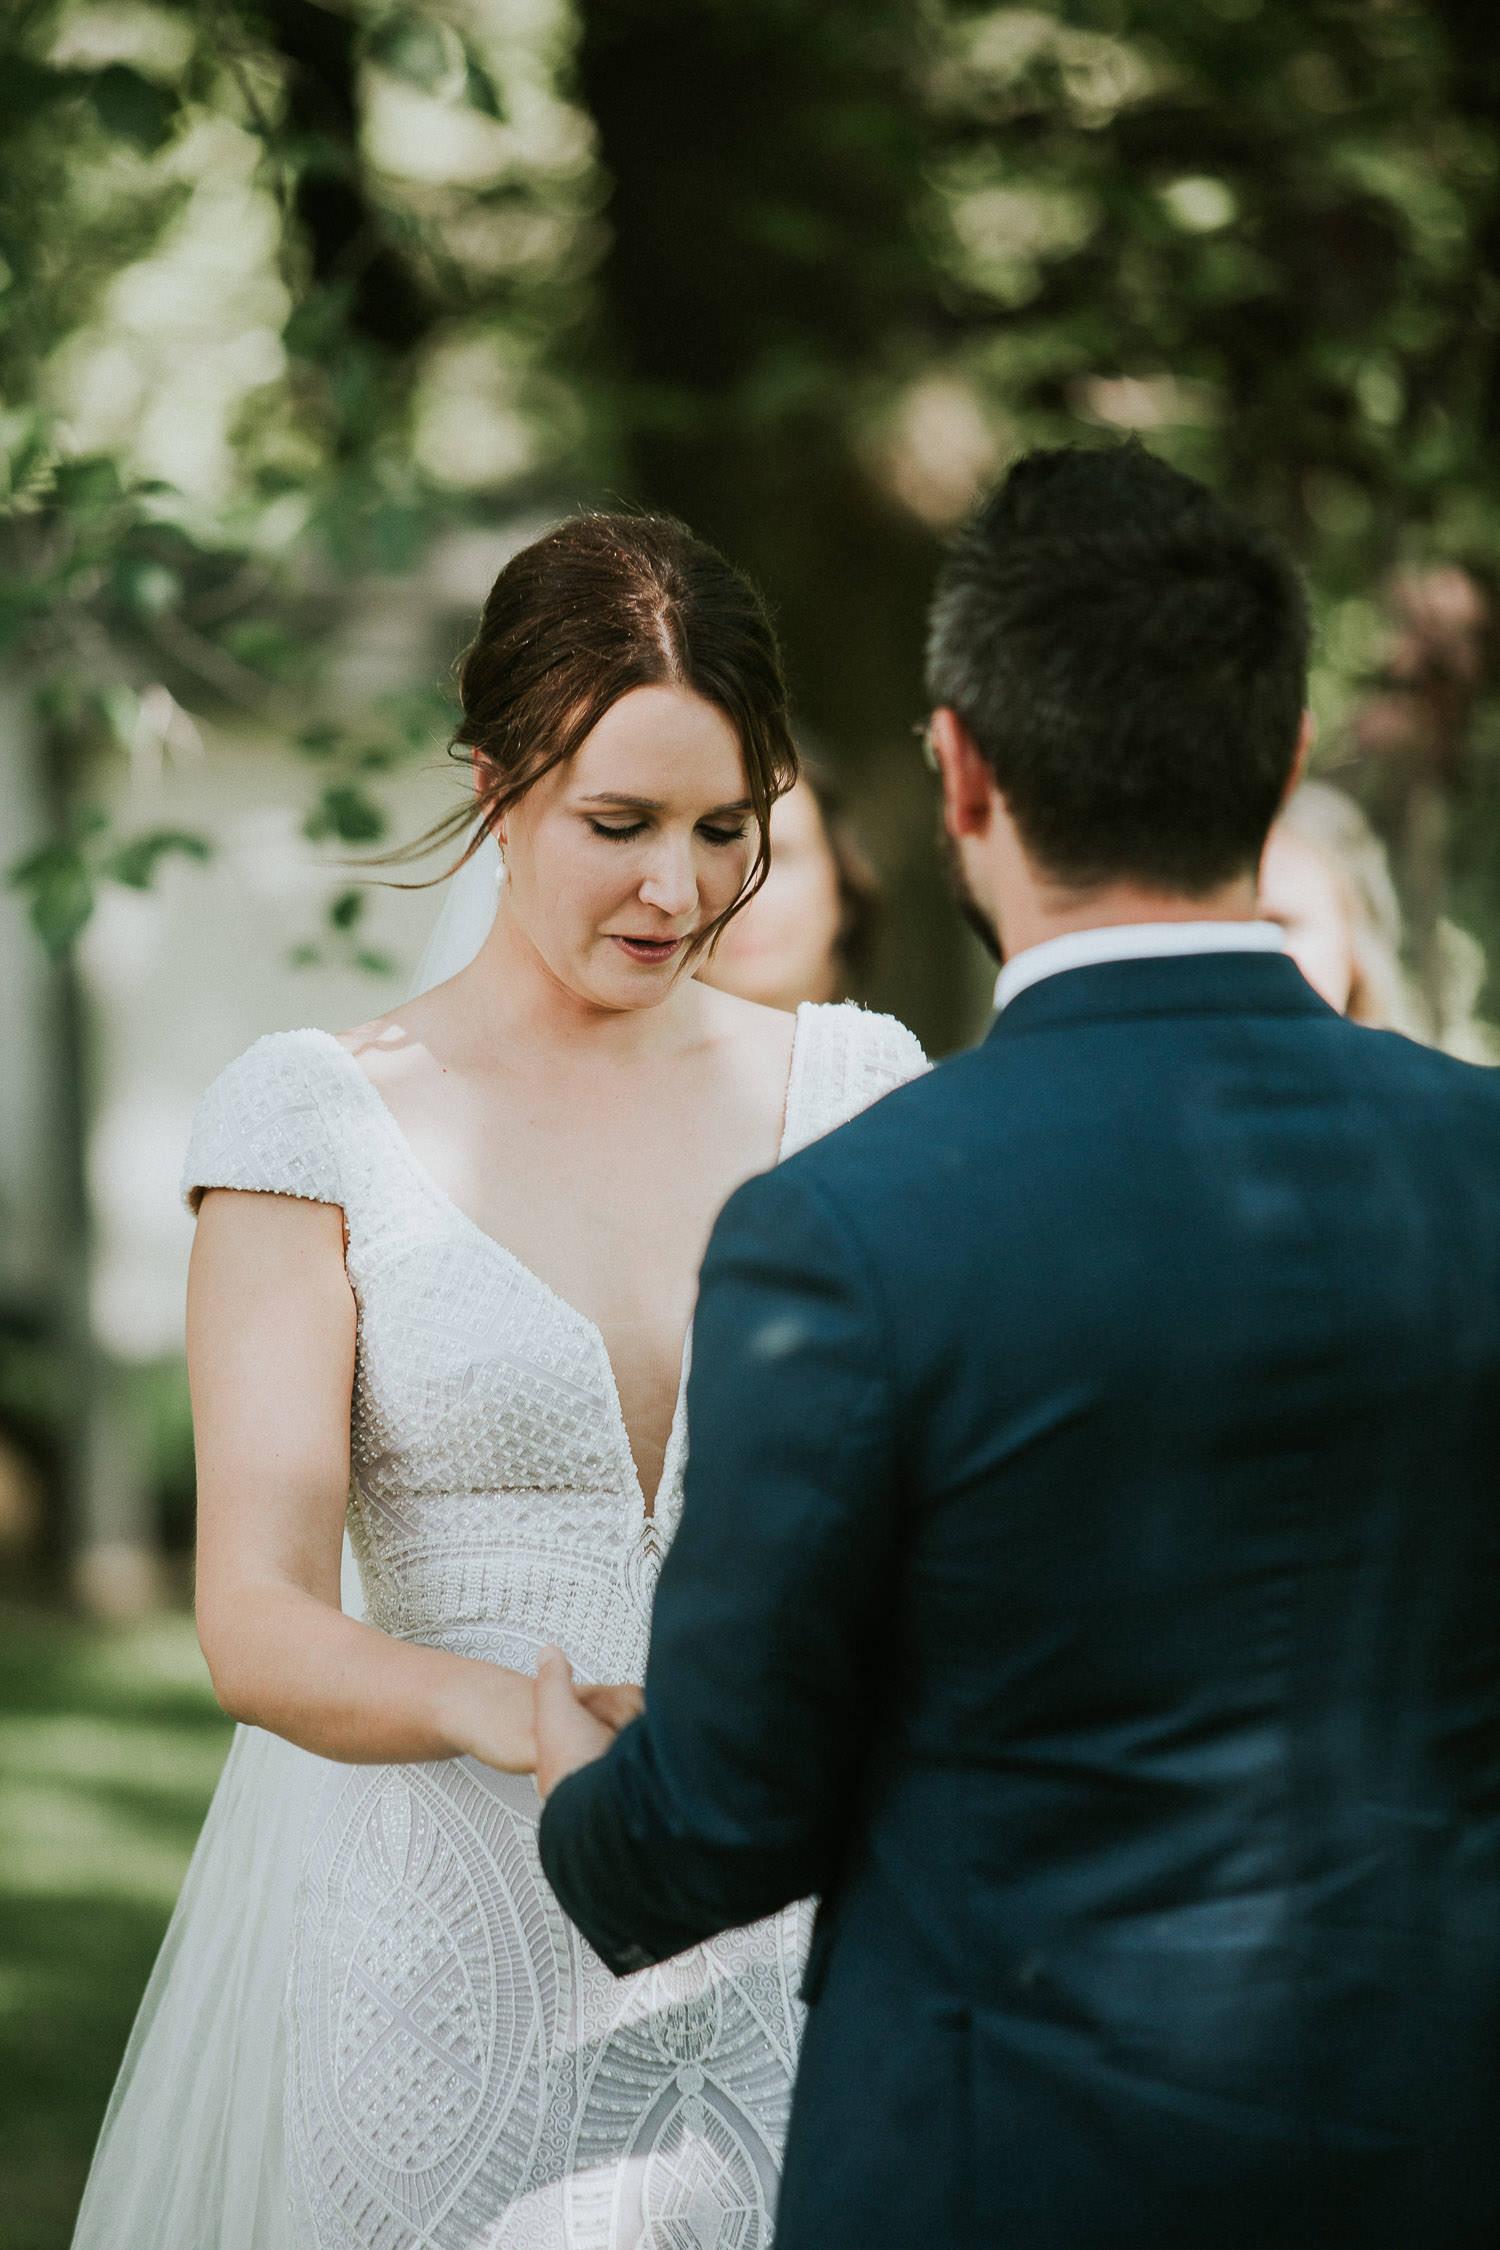 summer-backyard-wedding-in-alberta-sarah-pukin-0107